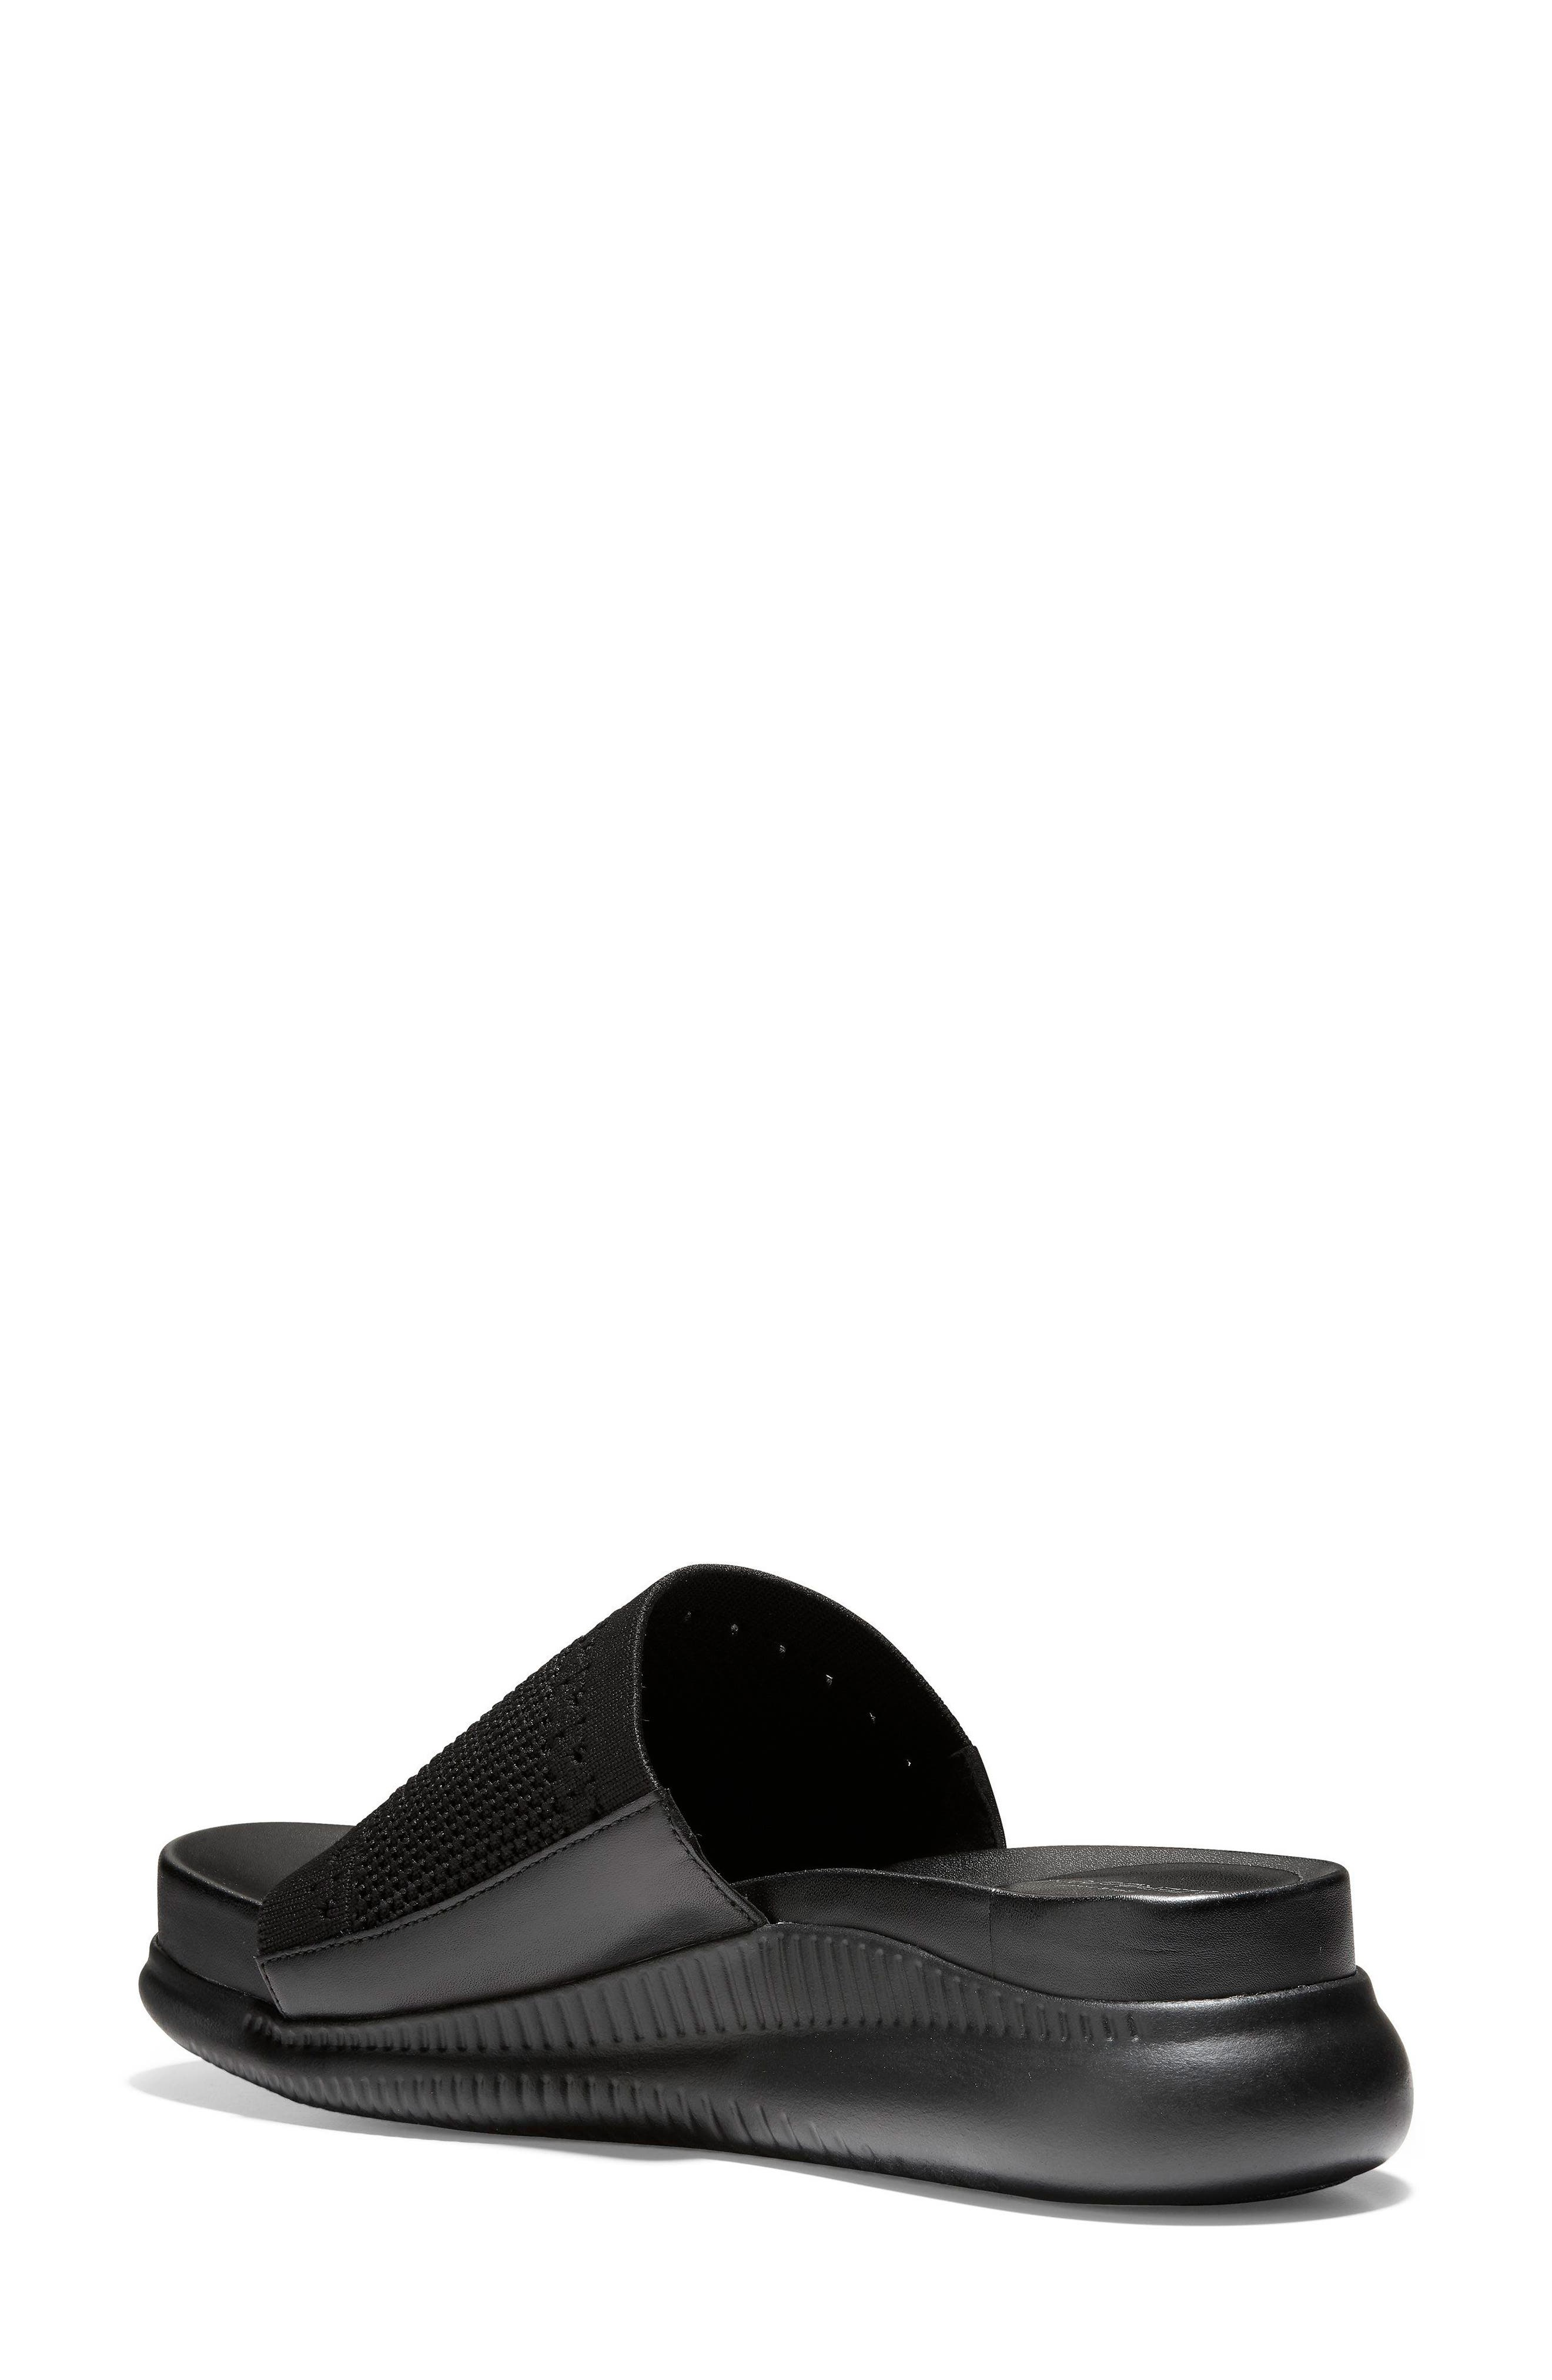 38 Faithful New Fun Multi Bright Print Full Clogs Shoe Dansko Work Wonders Size 7.5 Clothing, Shoes & Accessories